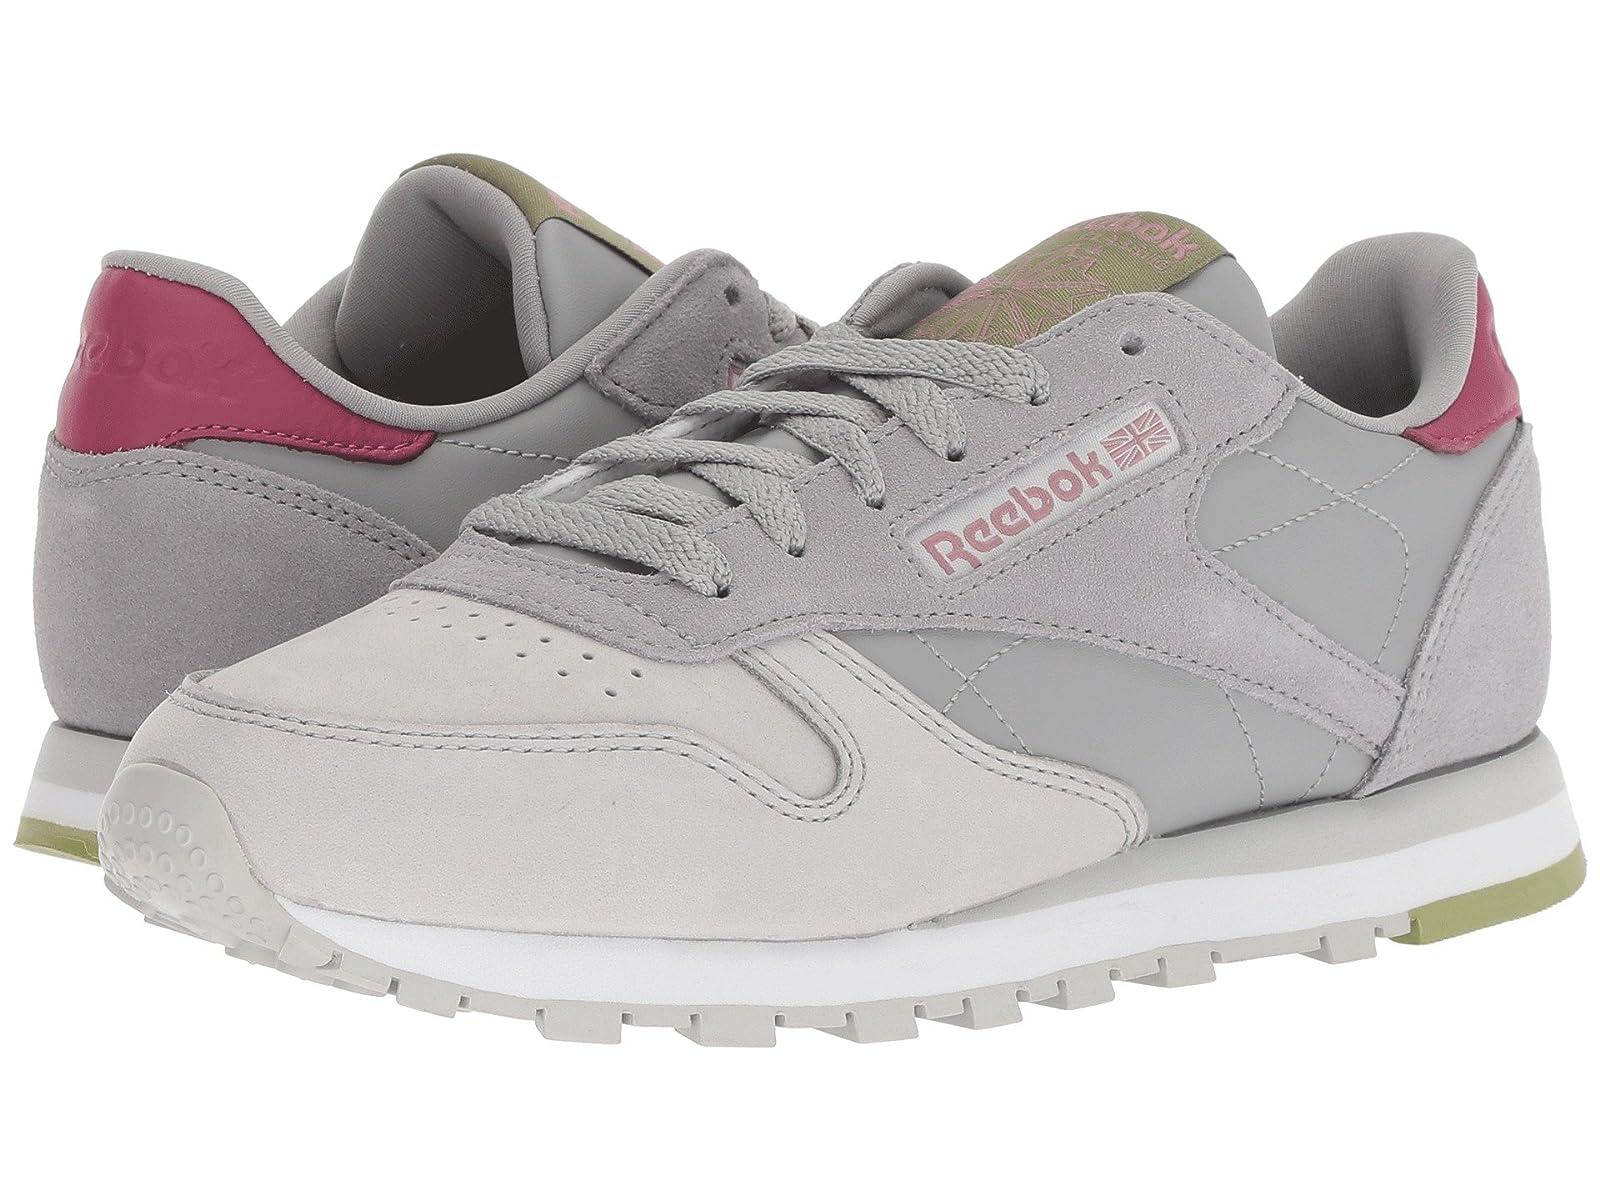 Reebok Lifestyle Classic LeatherAtmospheric grades have affordable shoes